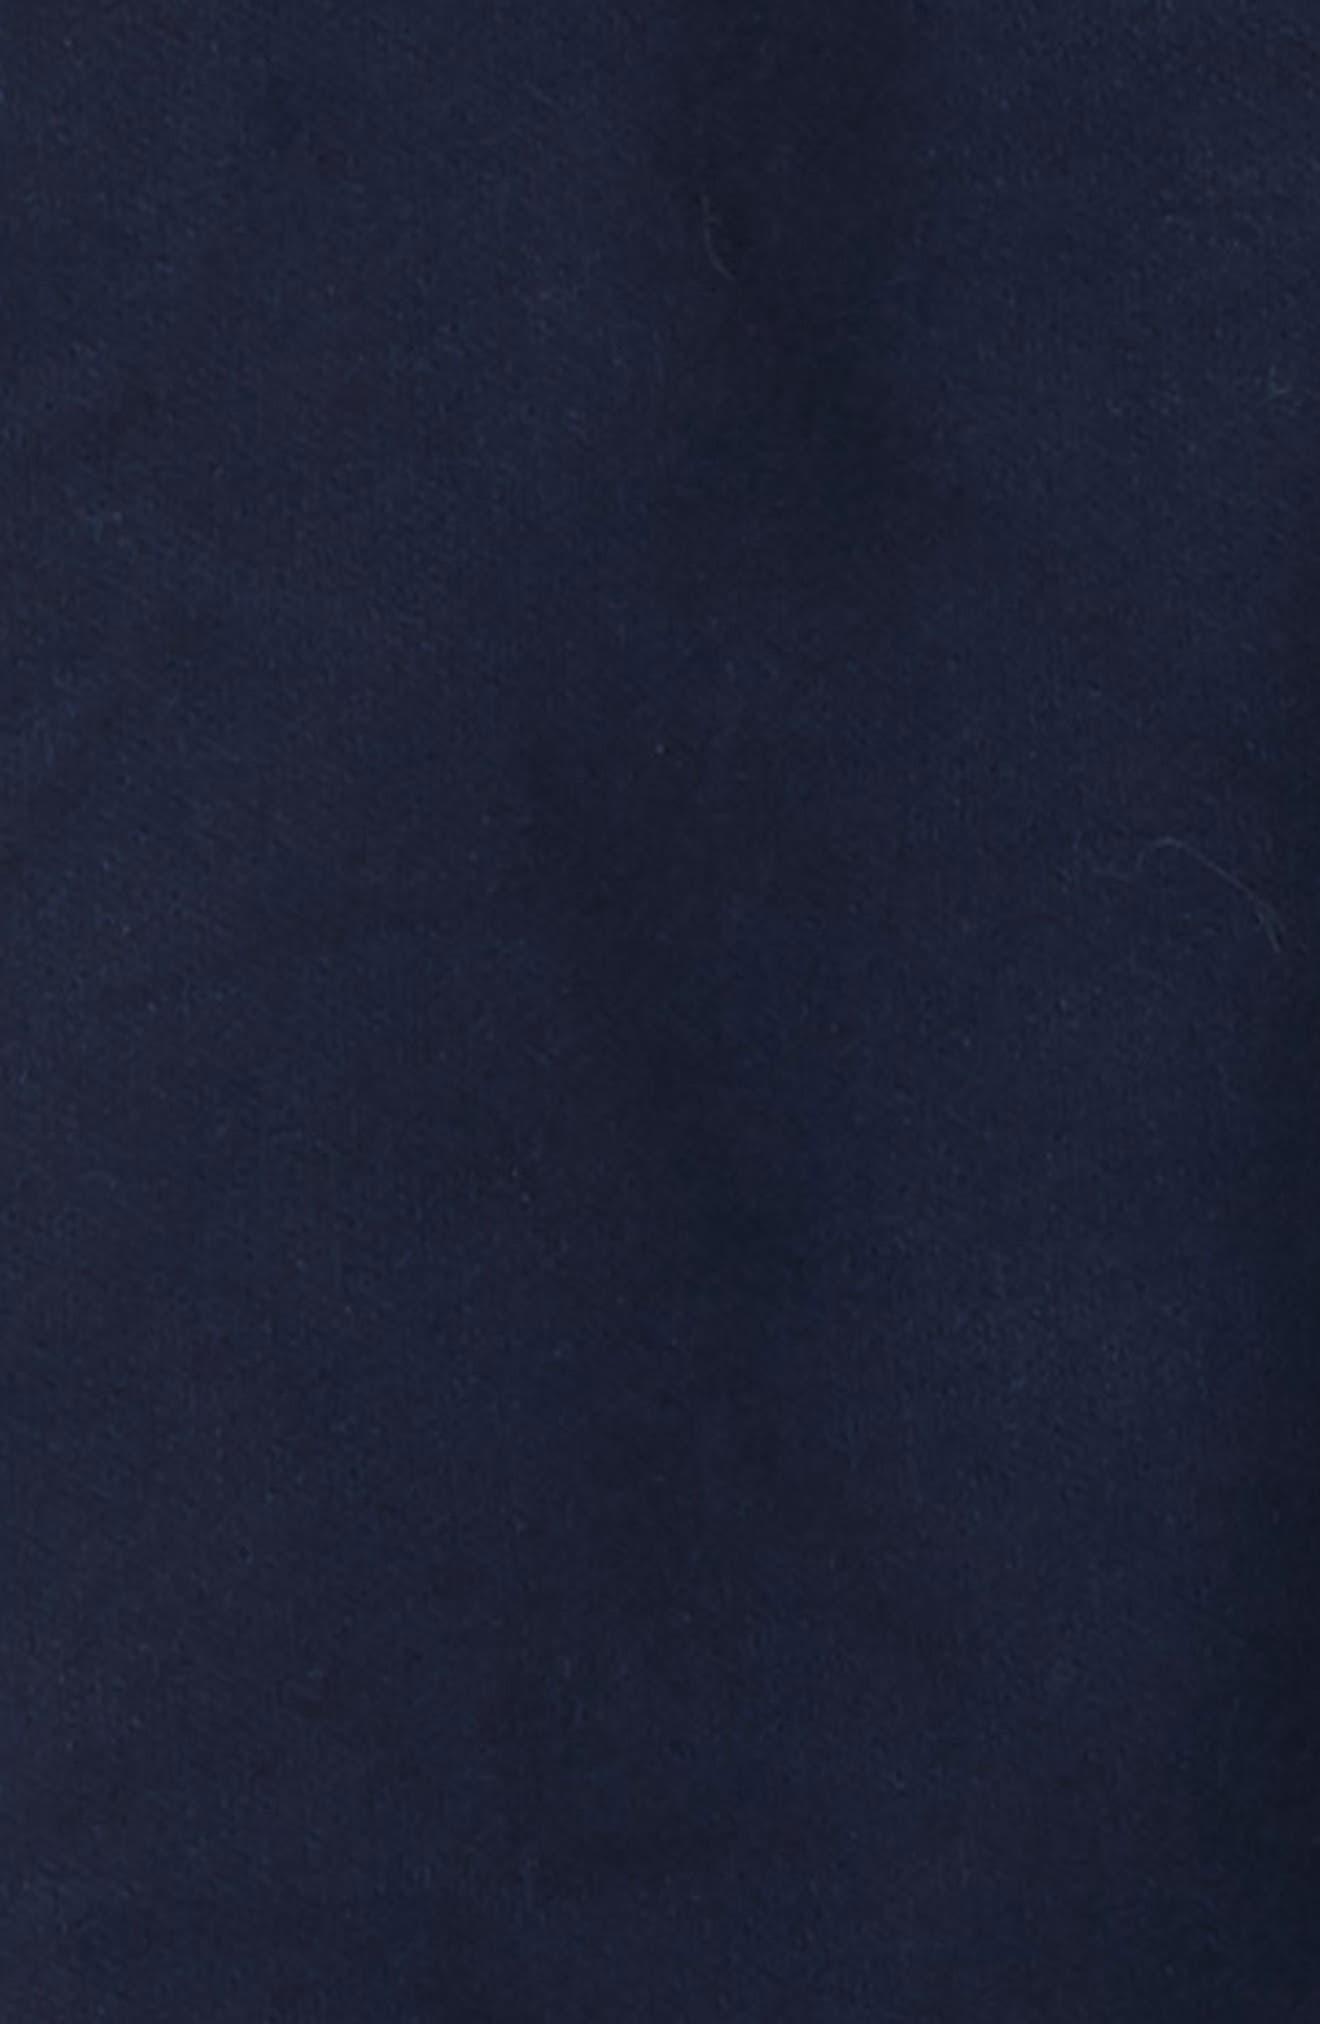 Cargo Pants,                             Alternate thumbnail 4, color,